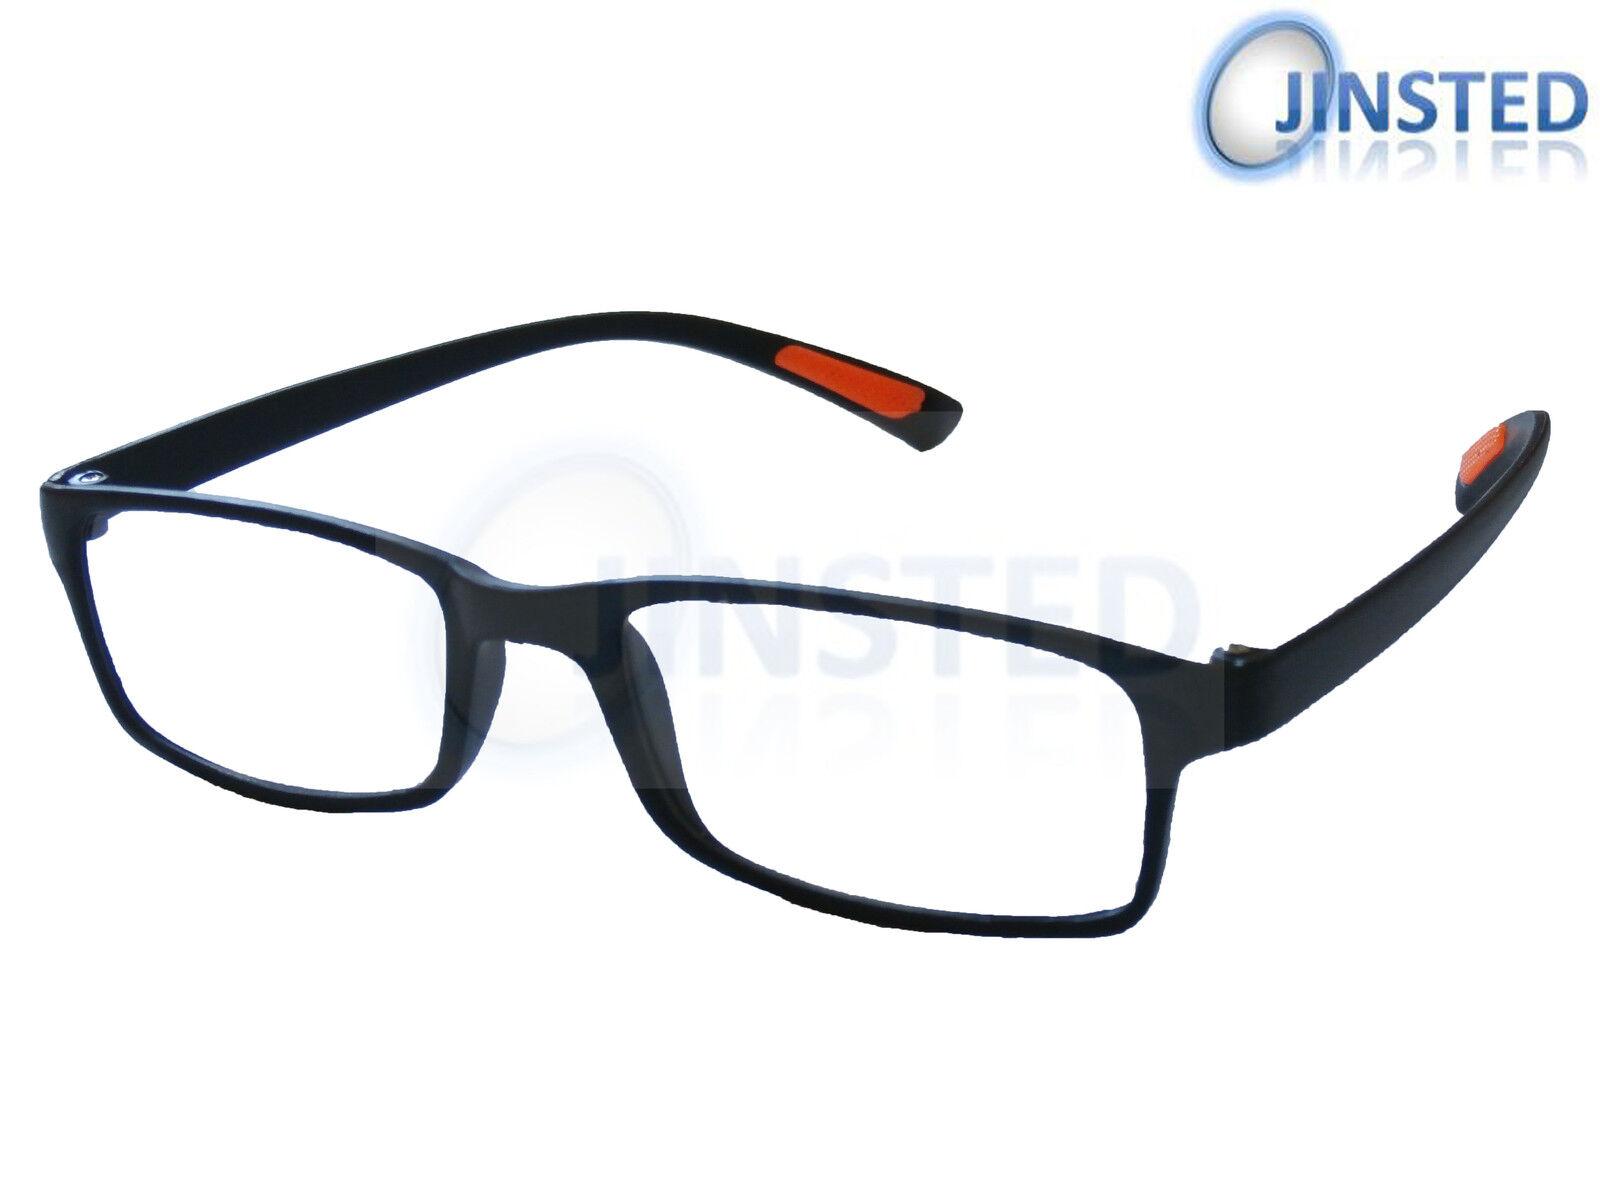 Black Lightweight Stylish Reading Glasses Specs Spectacles Unisex Readers RG007